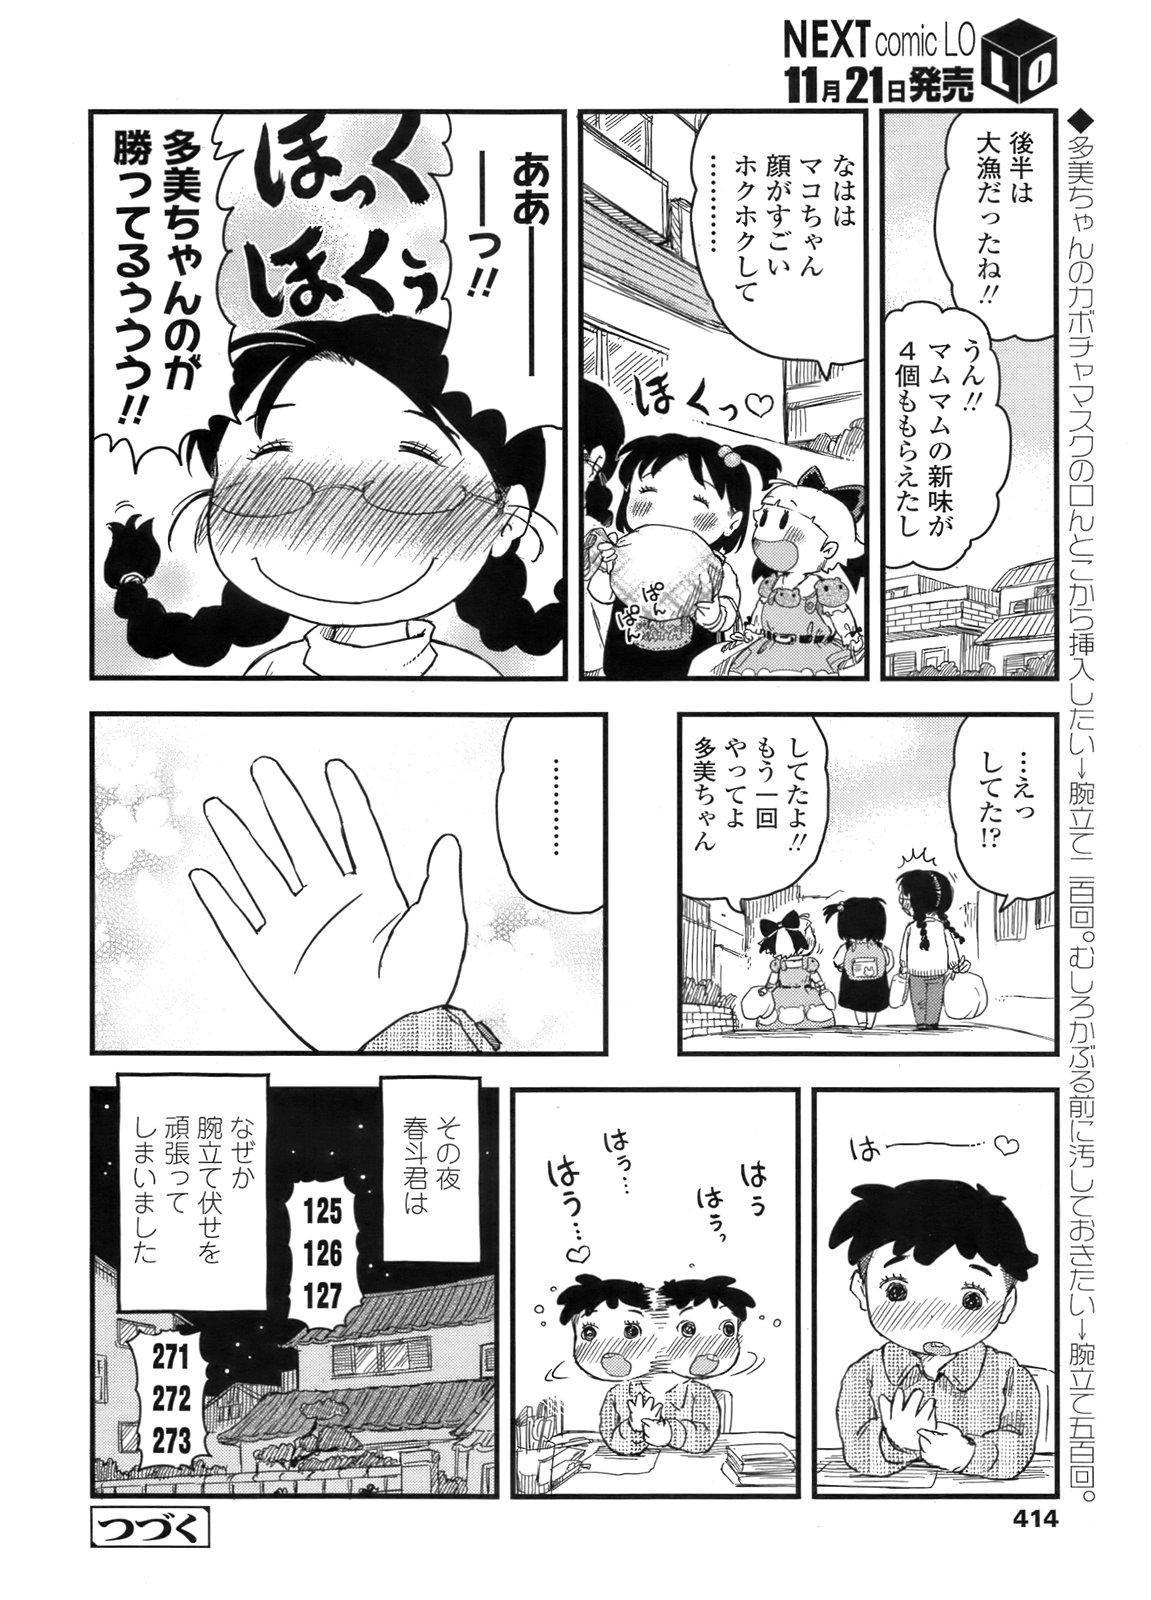 COMIC LO 2011-12 Vol. 93 414